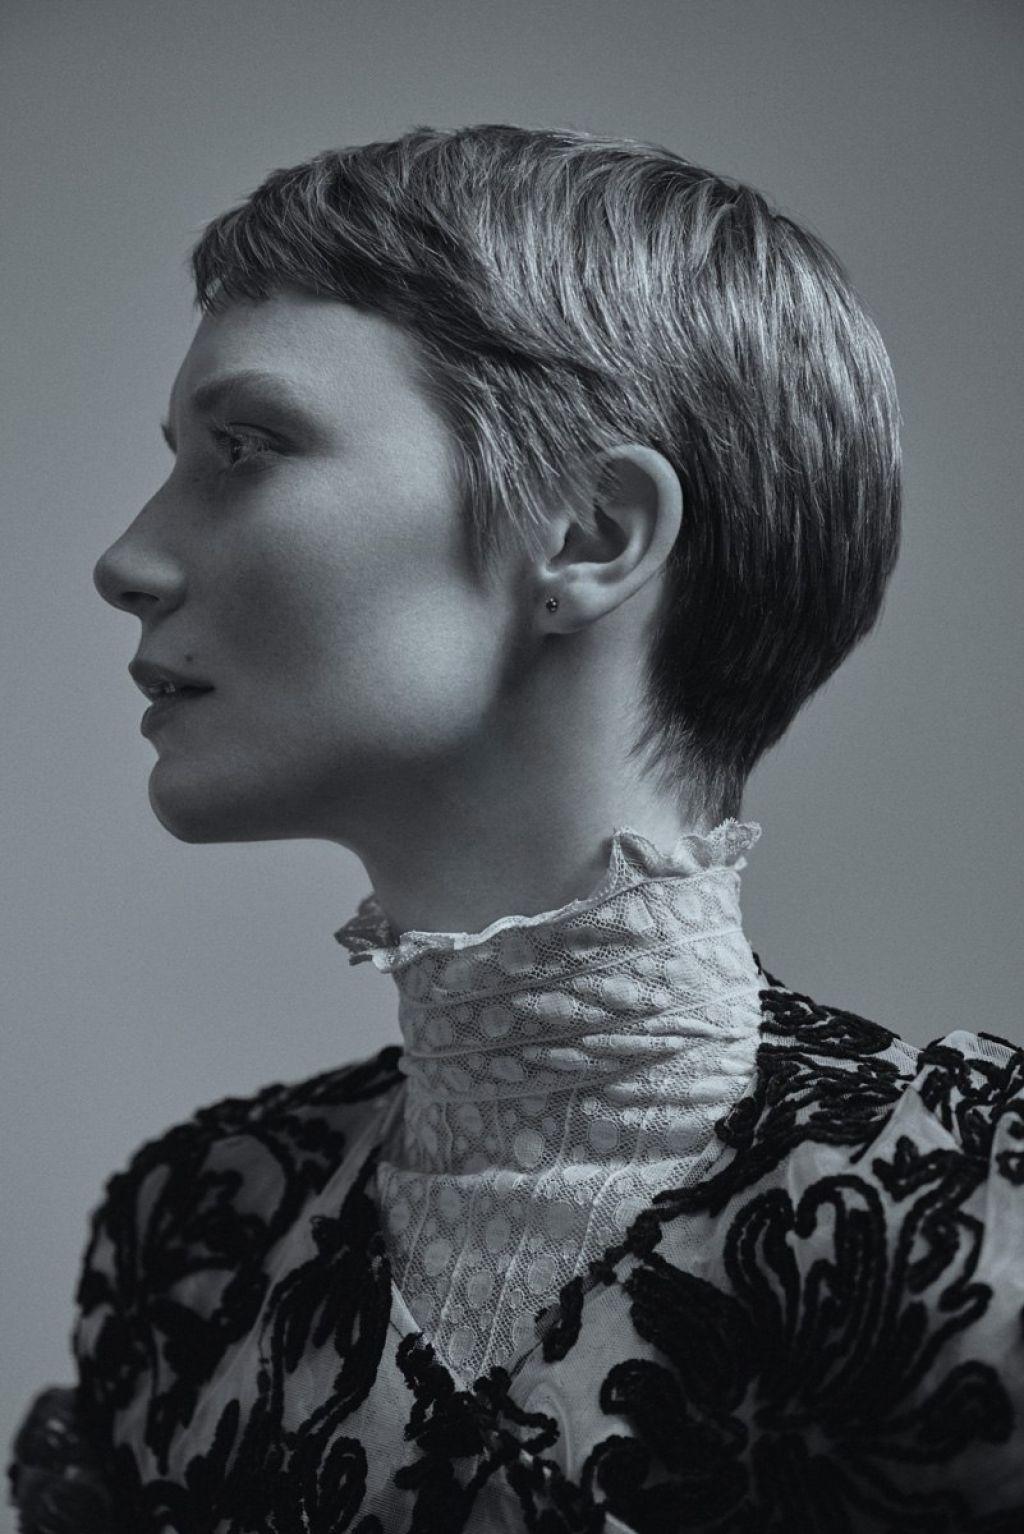 Mia Wasikowska Photoshoot For Flaunt Magazine 2015